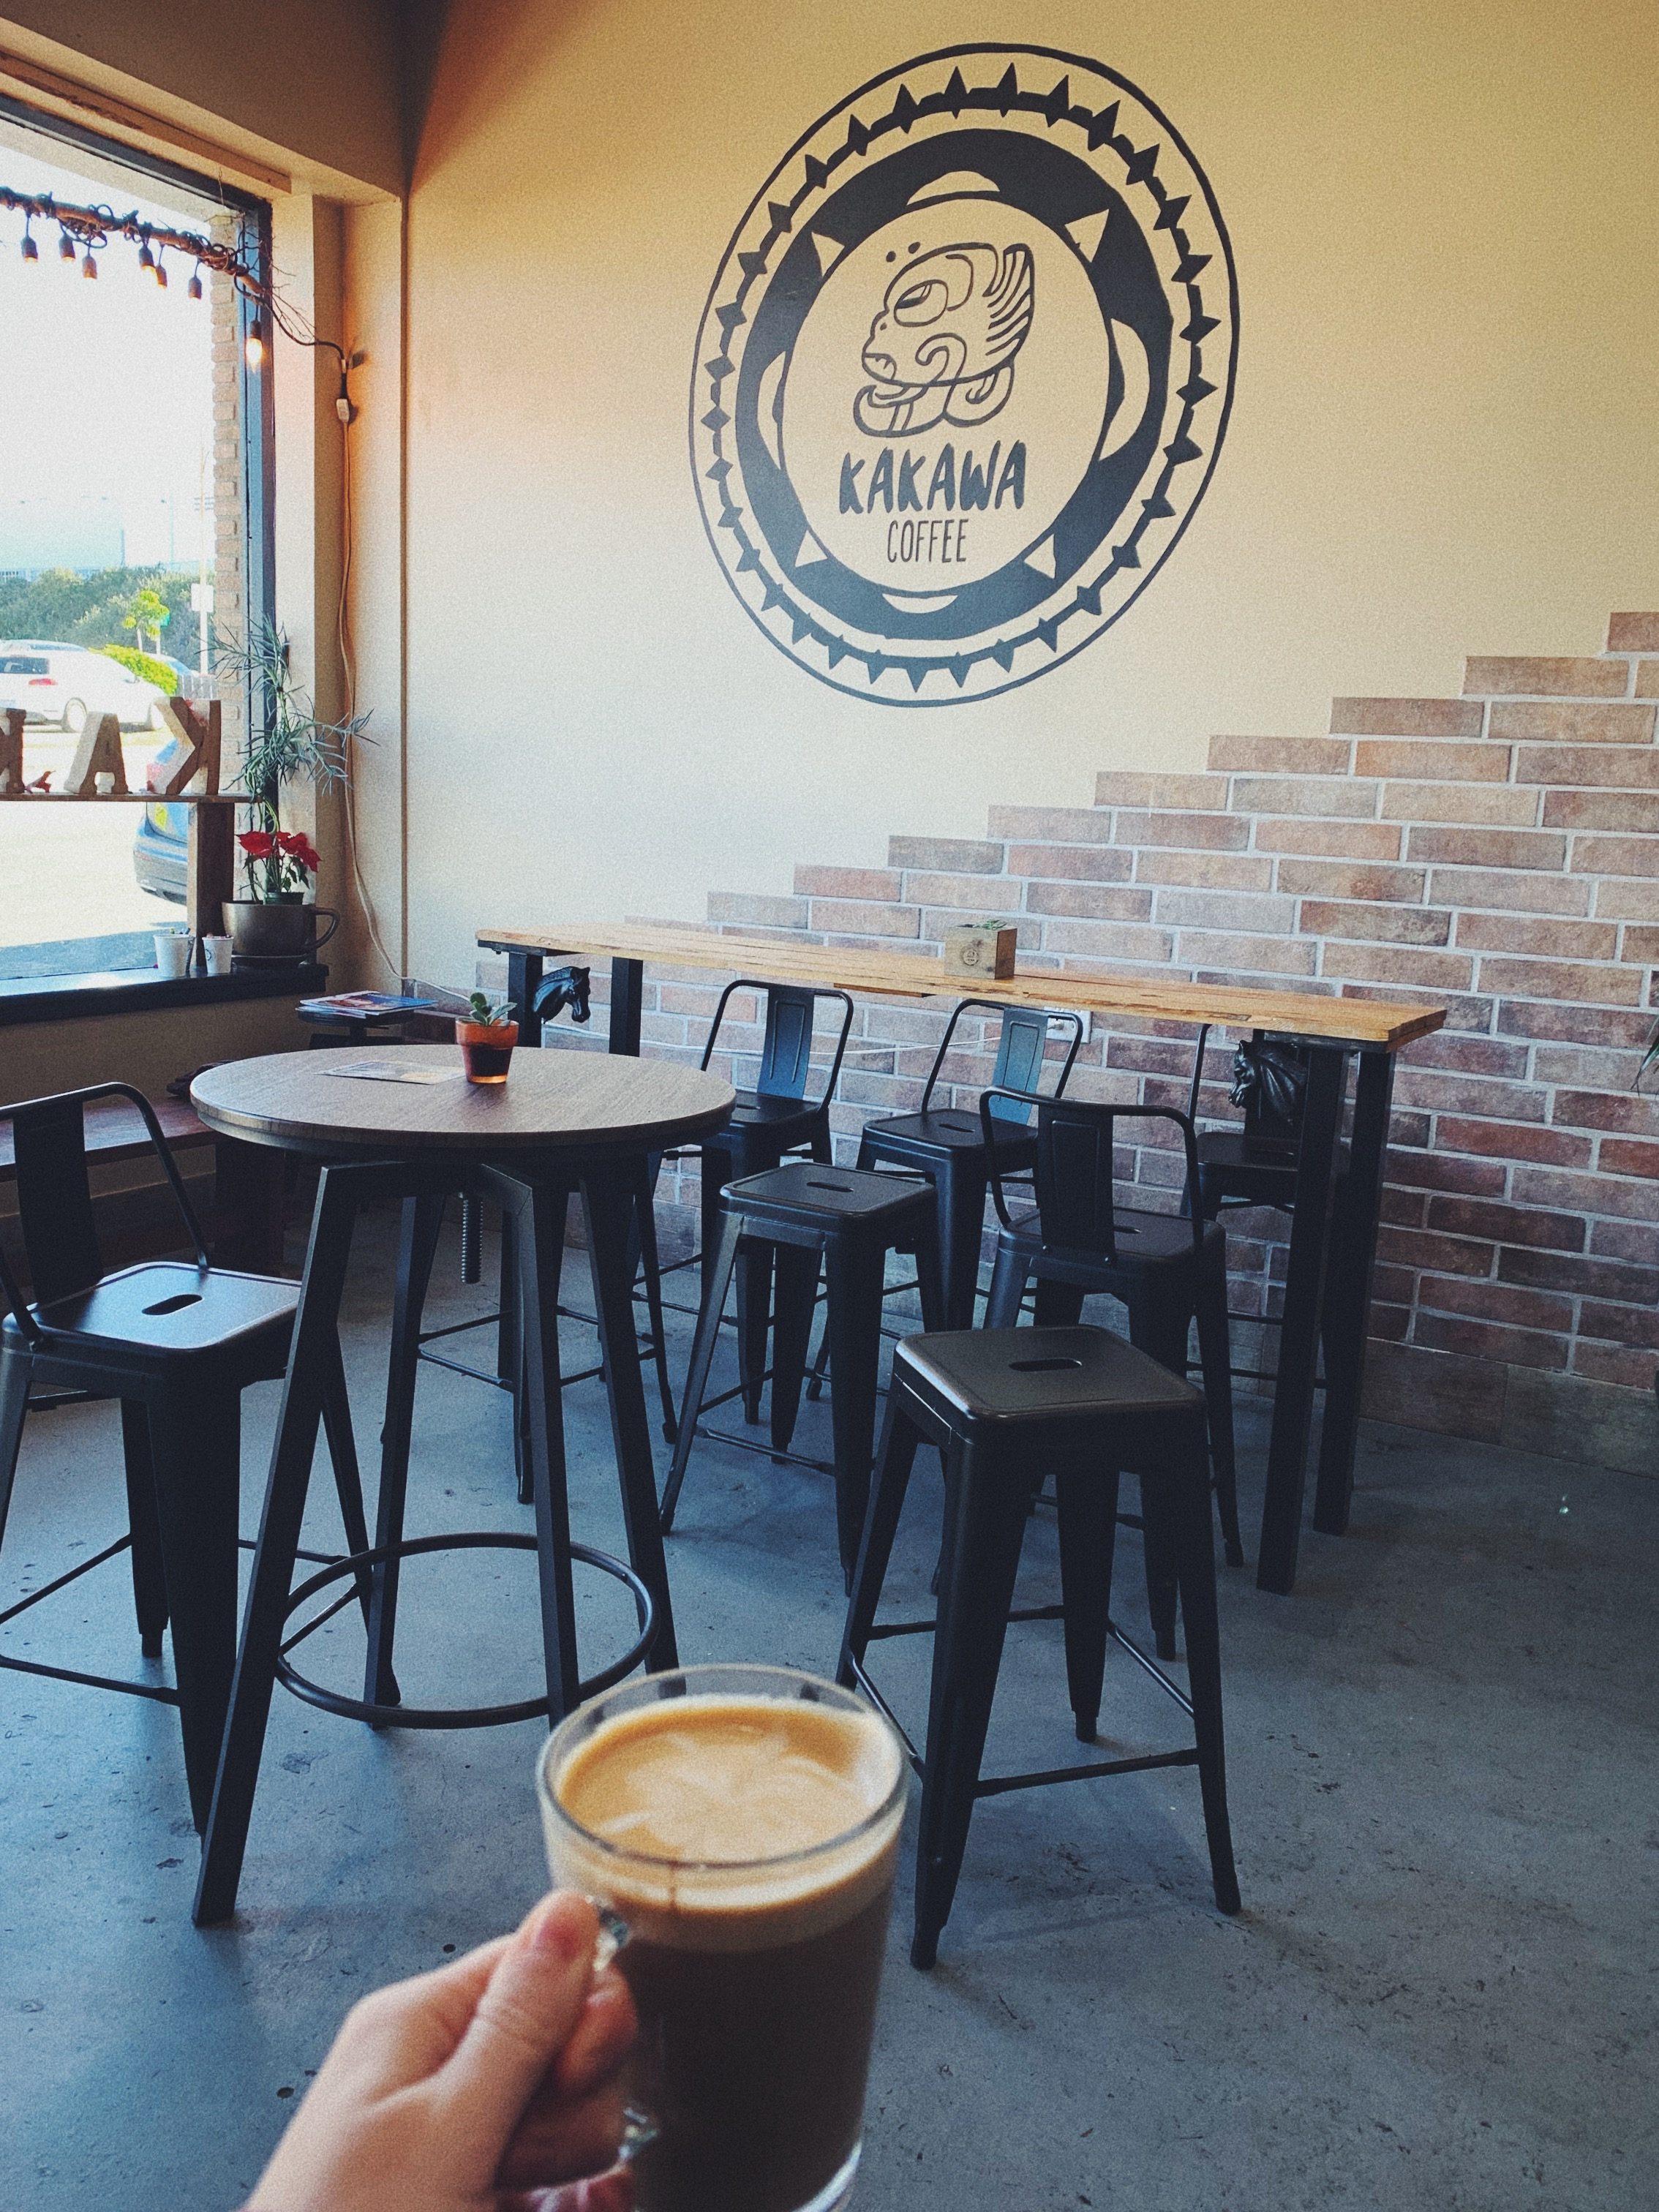 Checking out a local coffee shop: Kakawa Coffee.